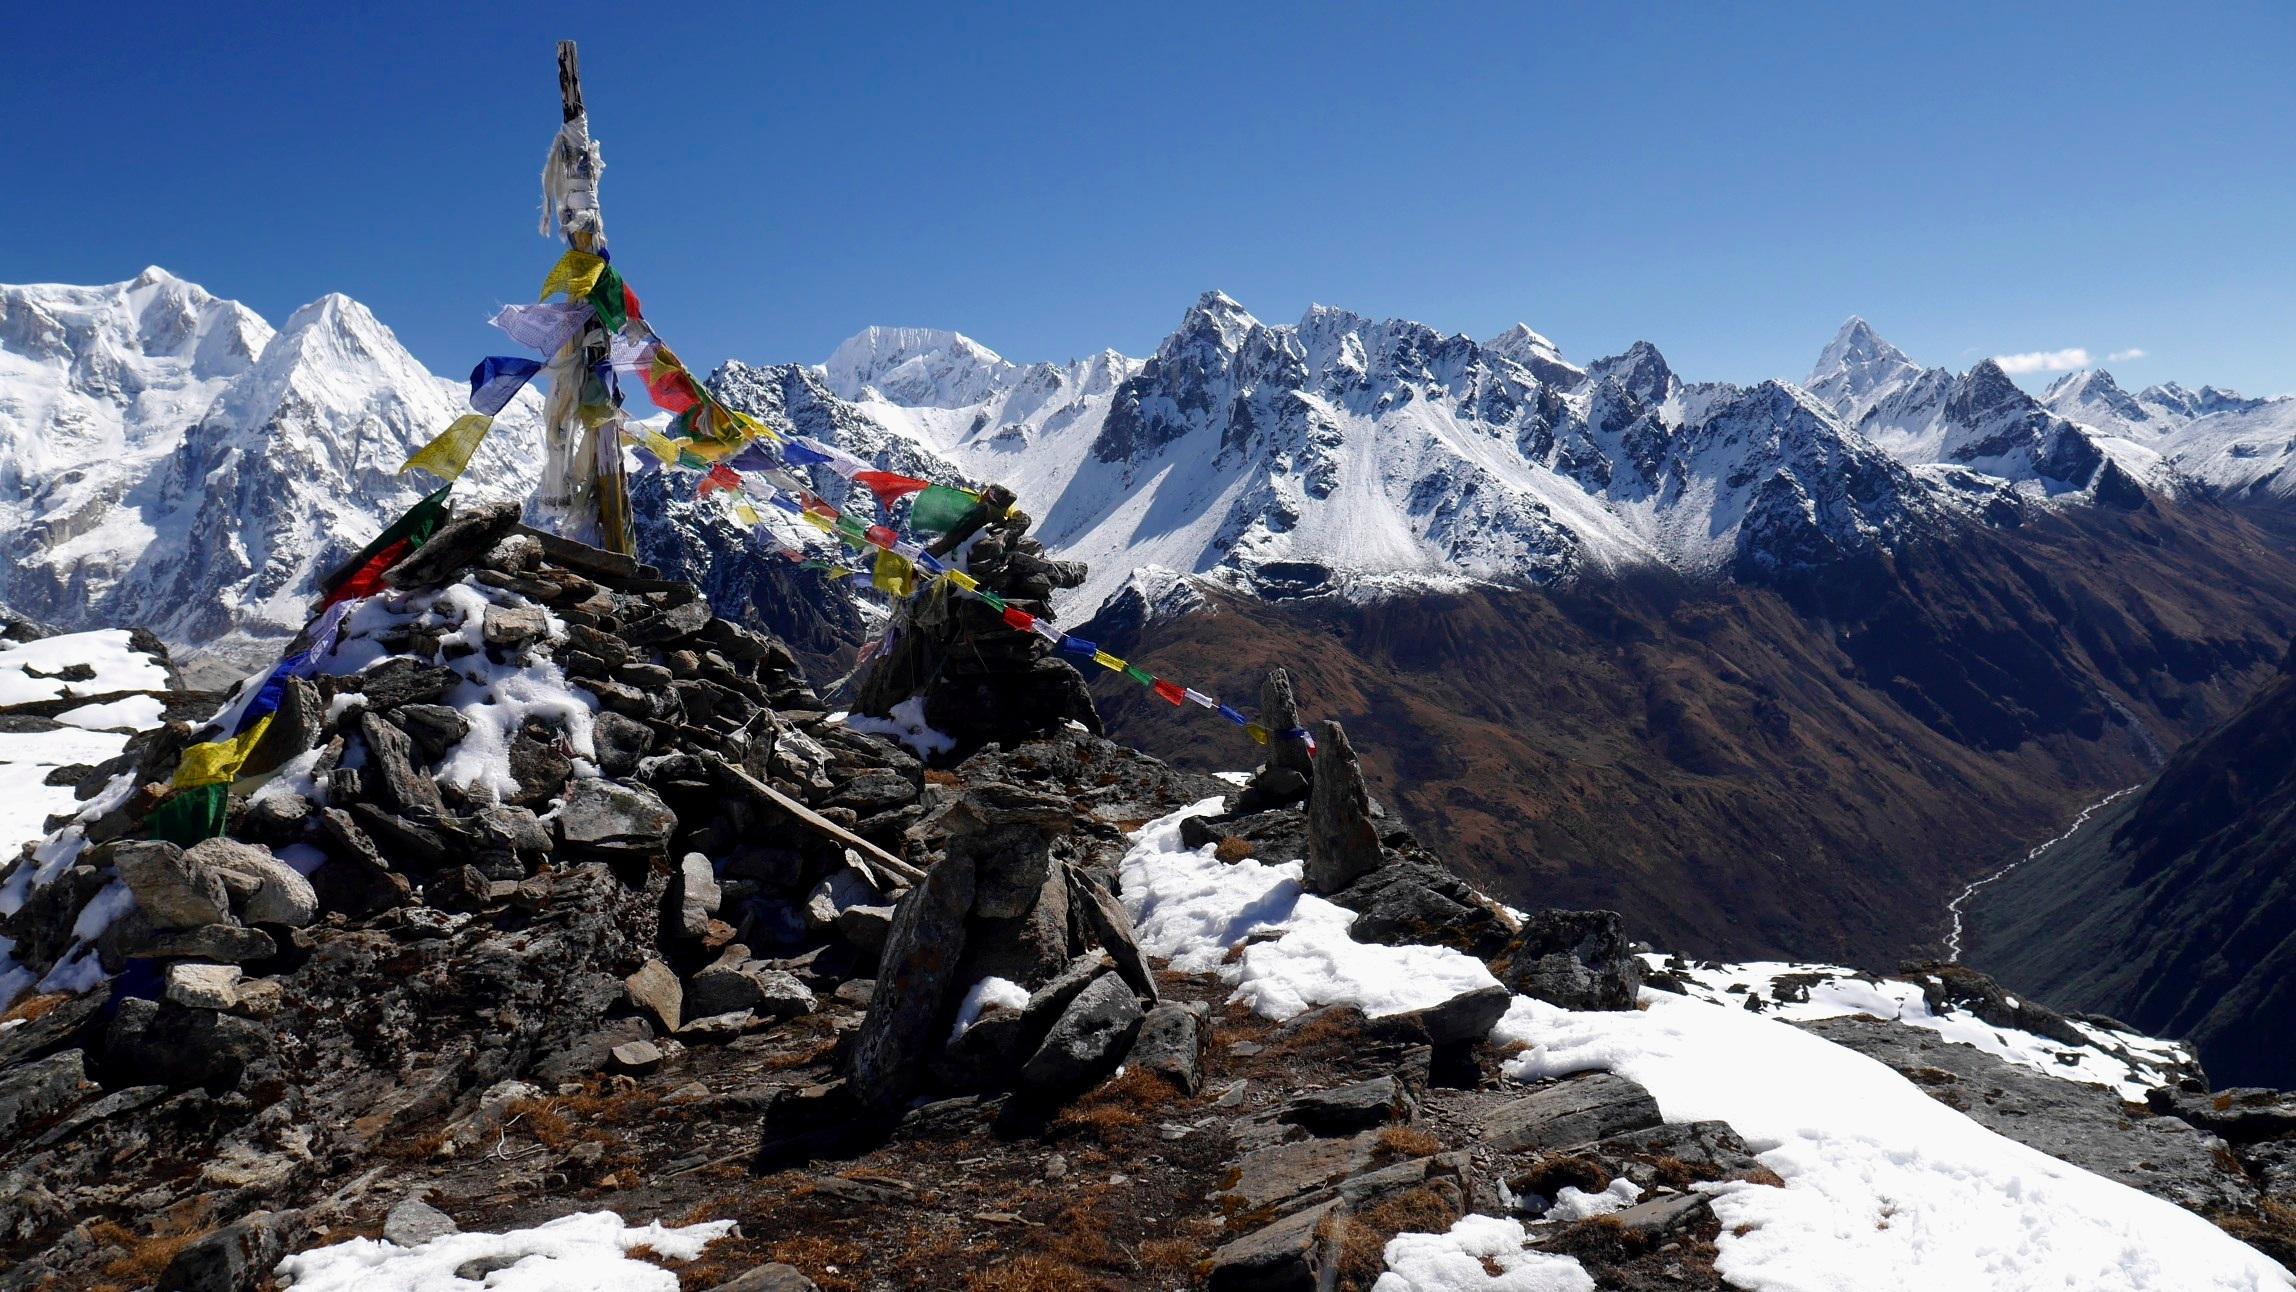 Sinjon La Pass 4,646m - looking at mountains India's Sikkim